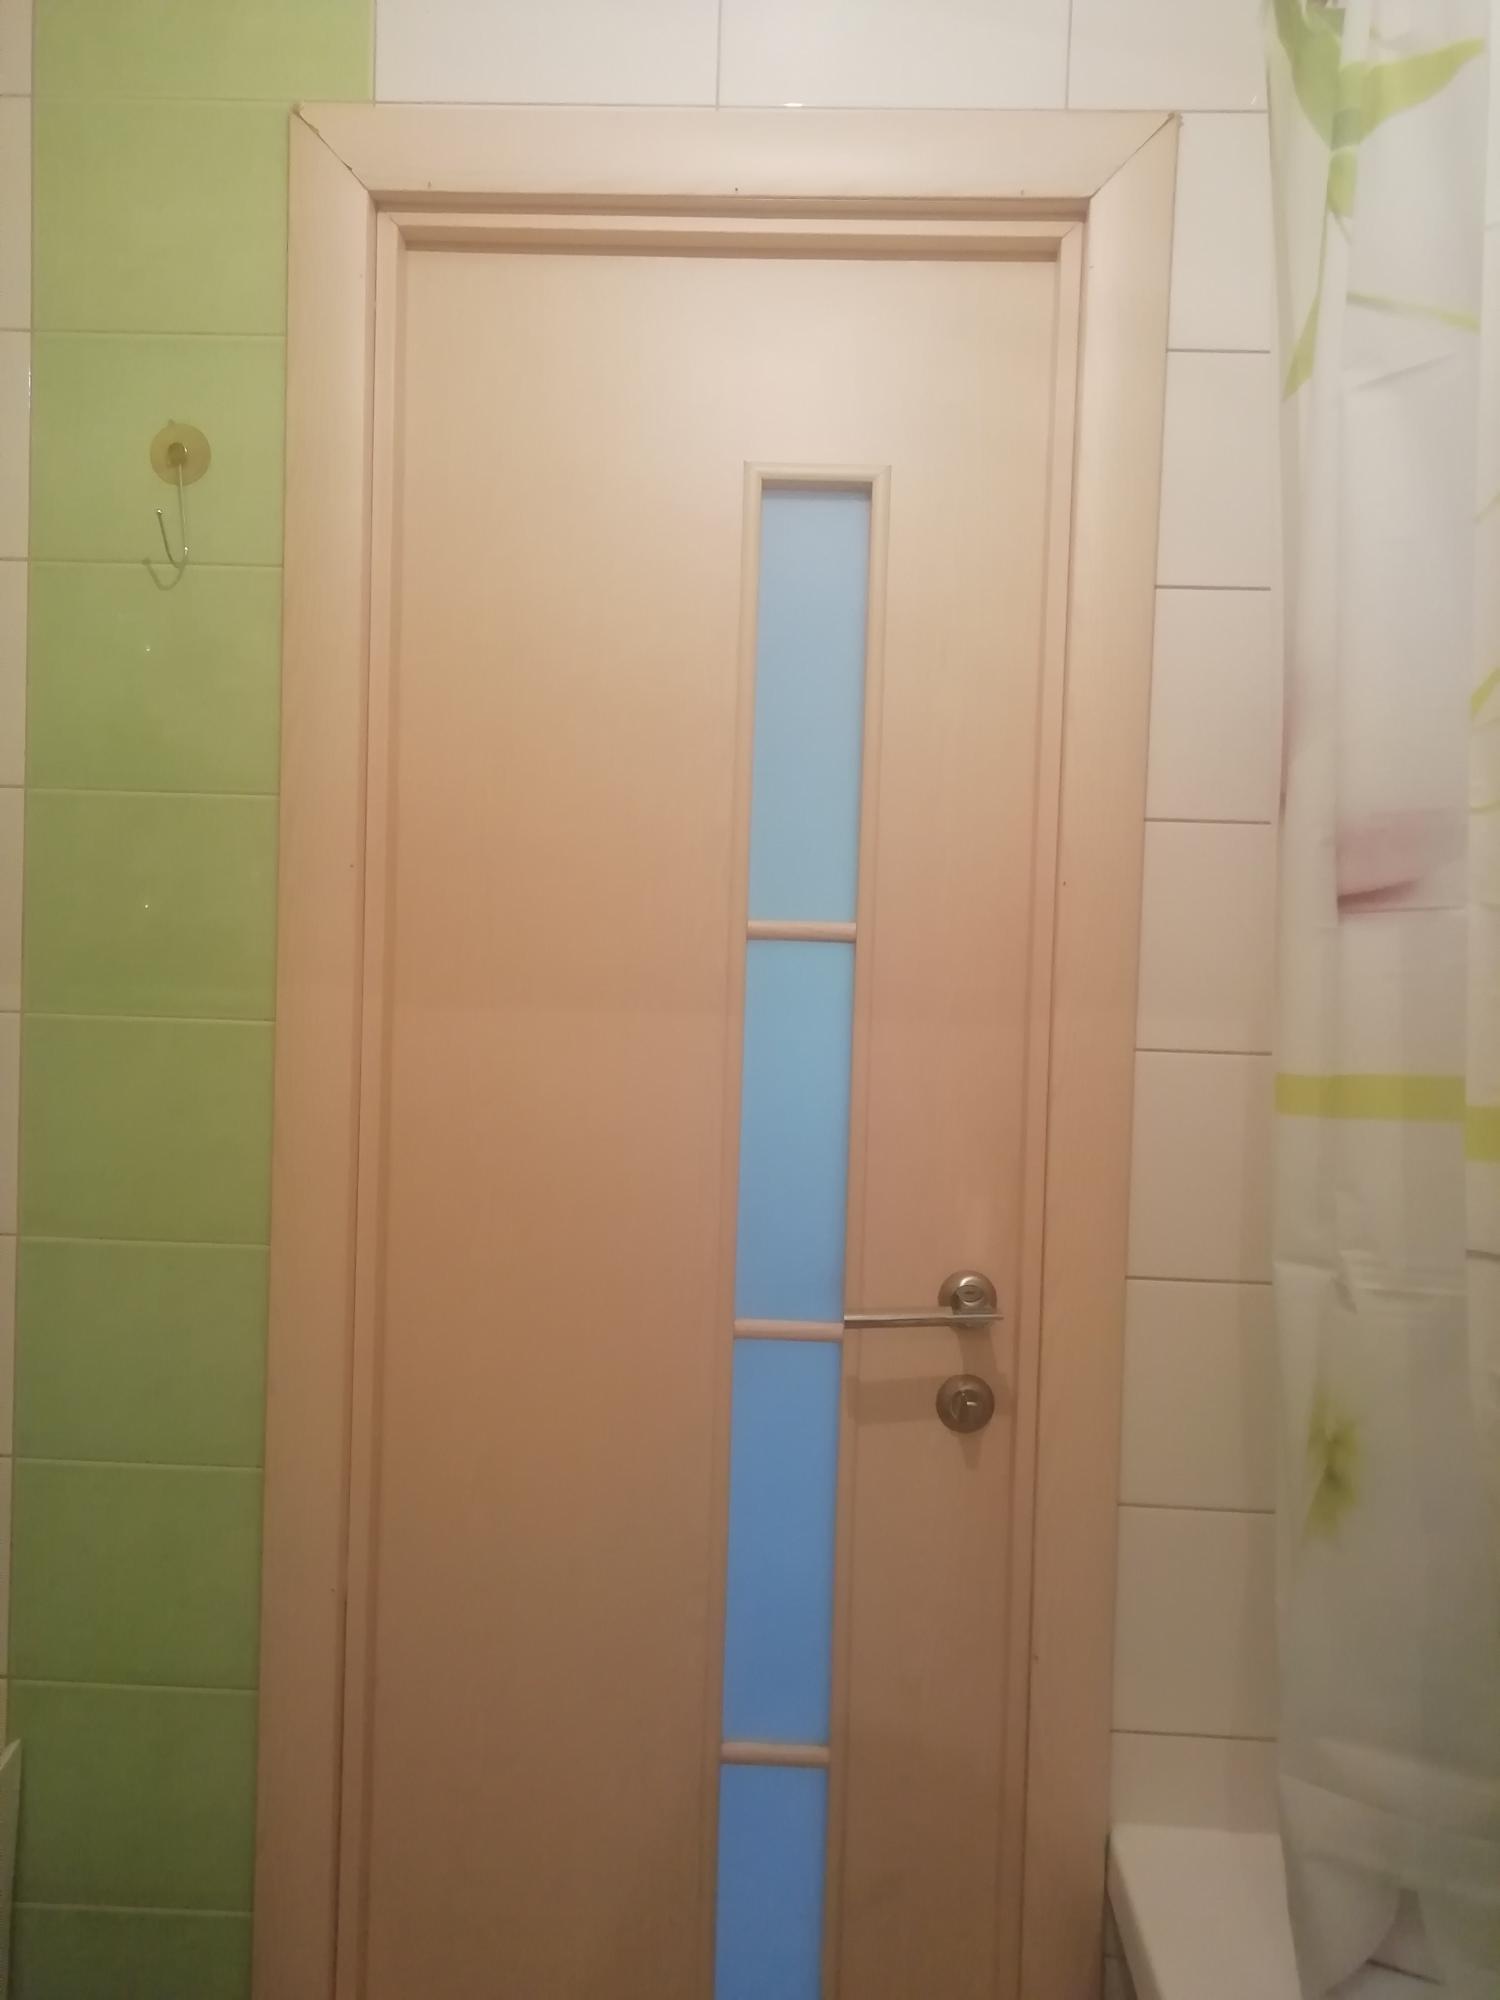 1к квартира Krasnoyarsk, Krupskoy Street, 8 | 16000 | аренда в Красноярске фото 3